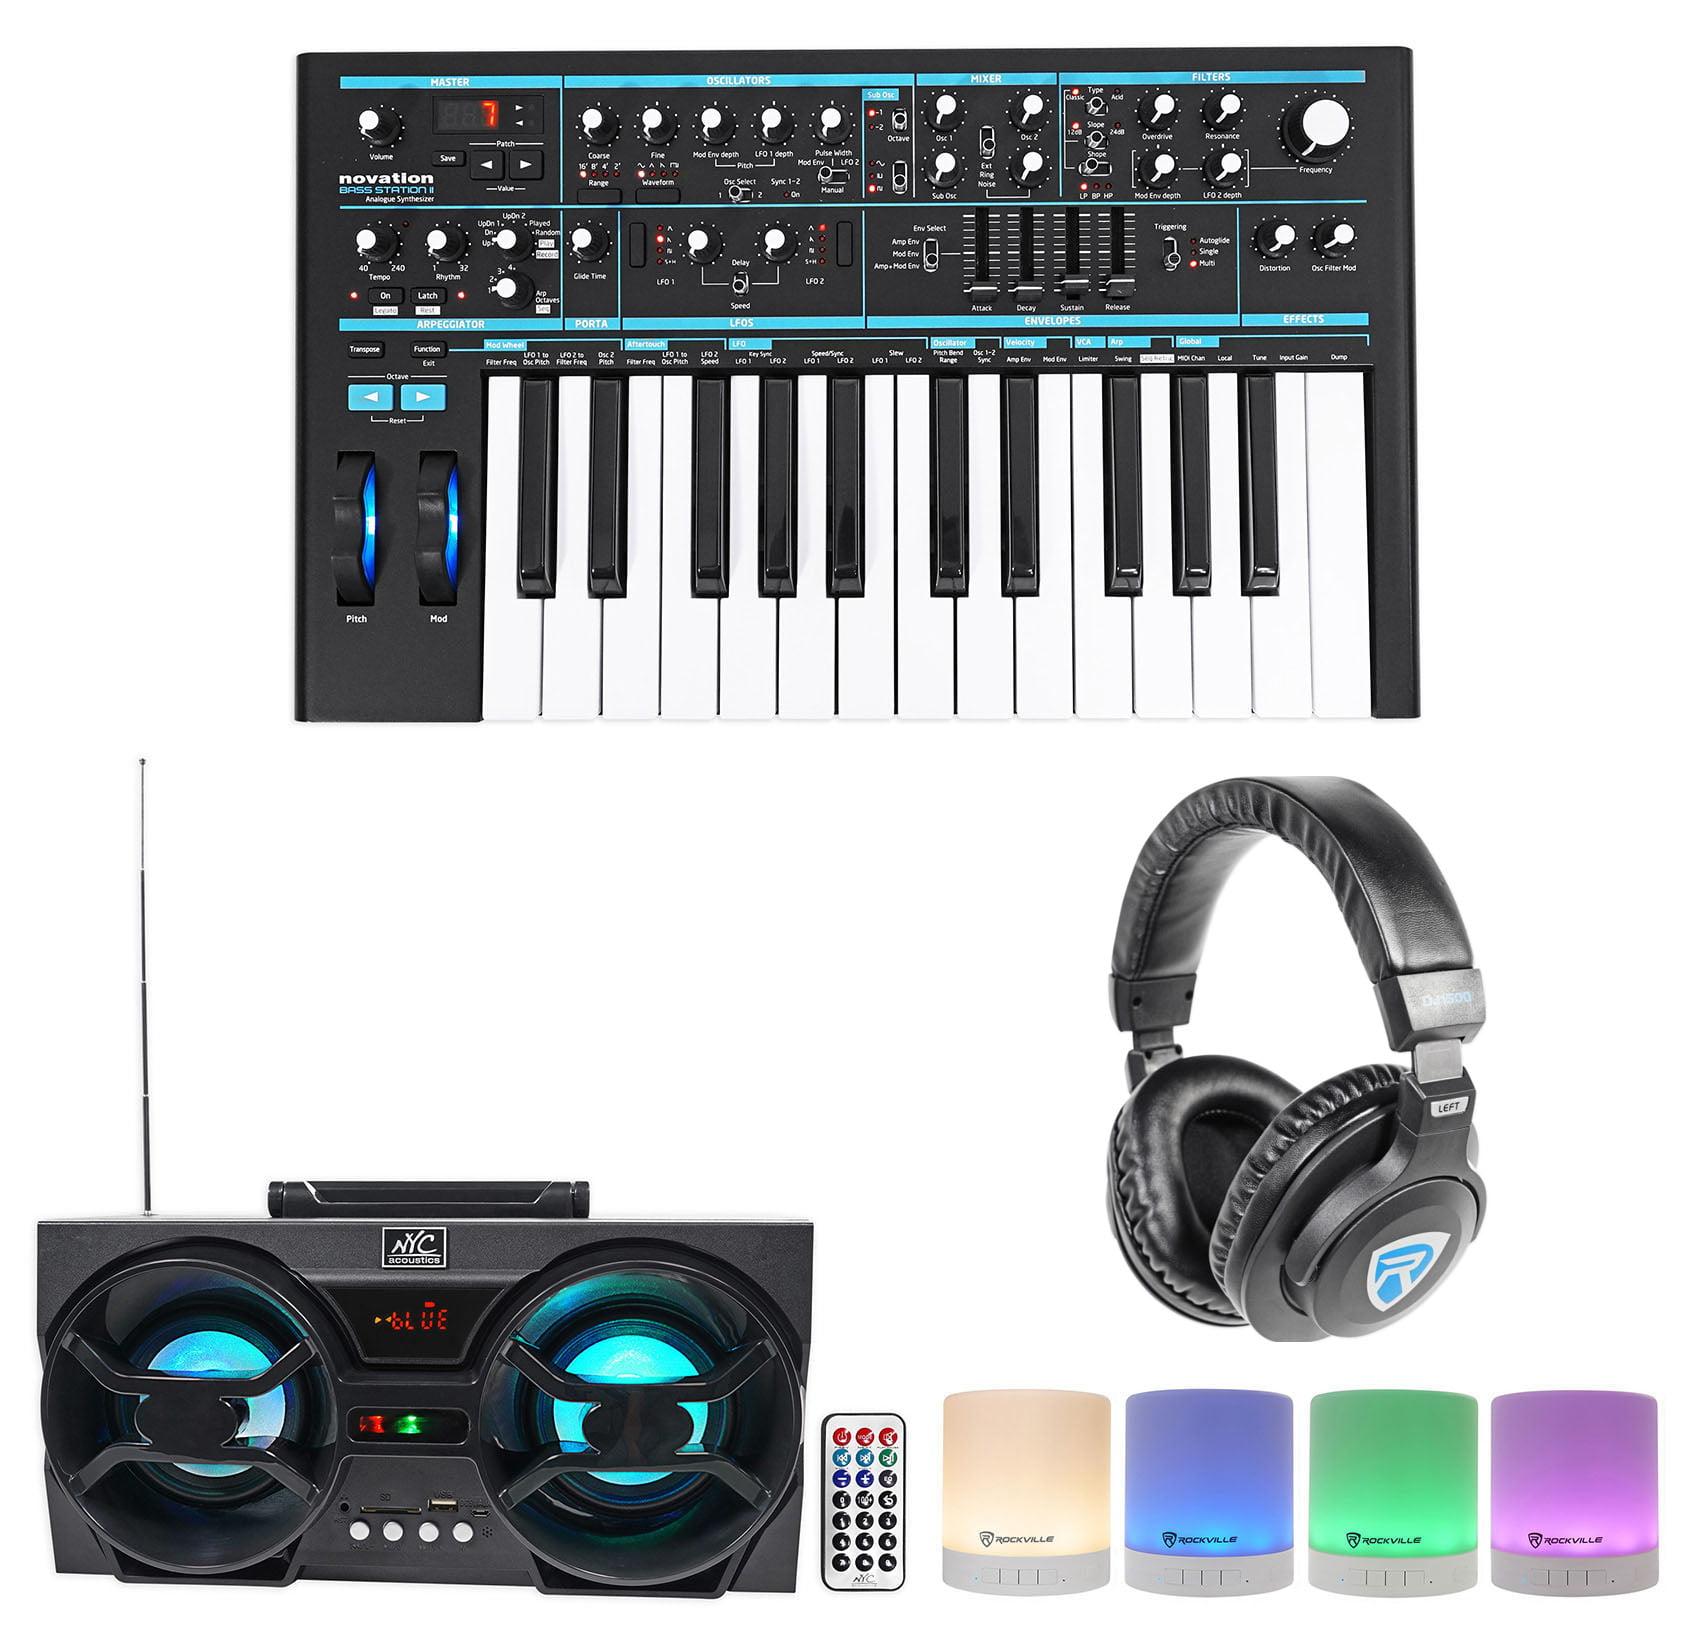 Novation BASS STATION II 25-Key MIDI USB Keyboard+Headphones+Bluetooth Speakers by NOVATION